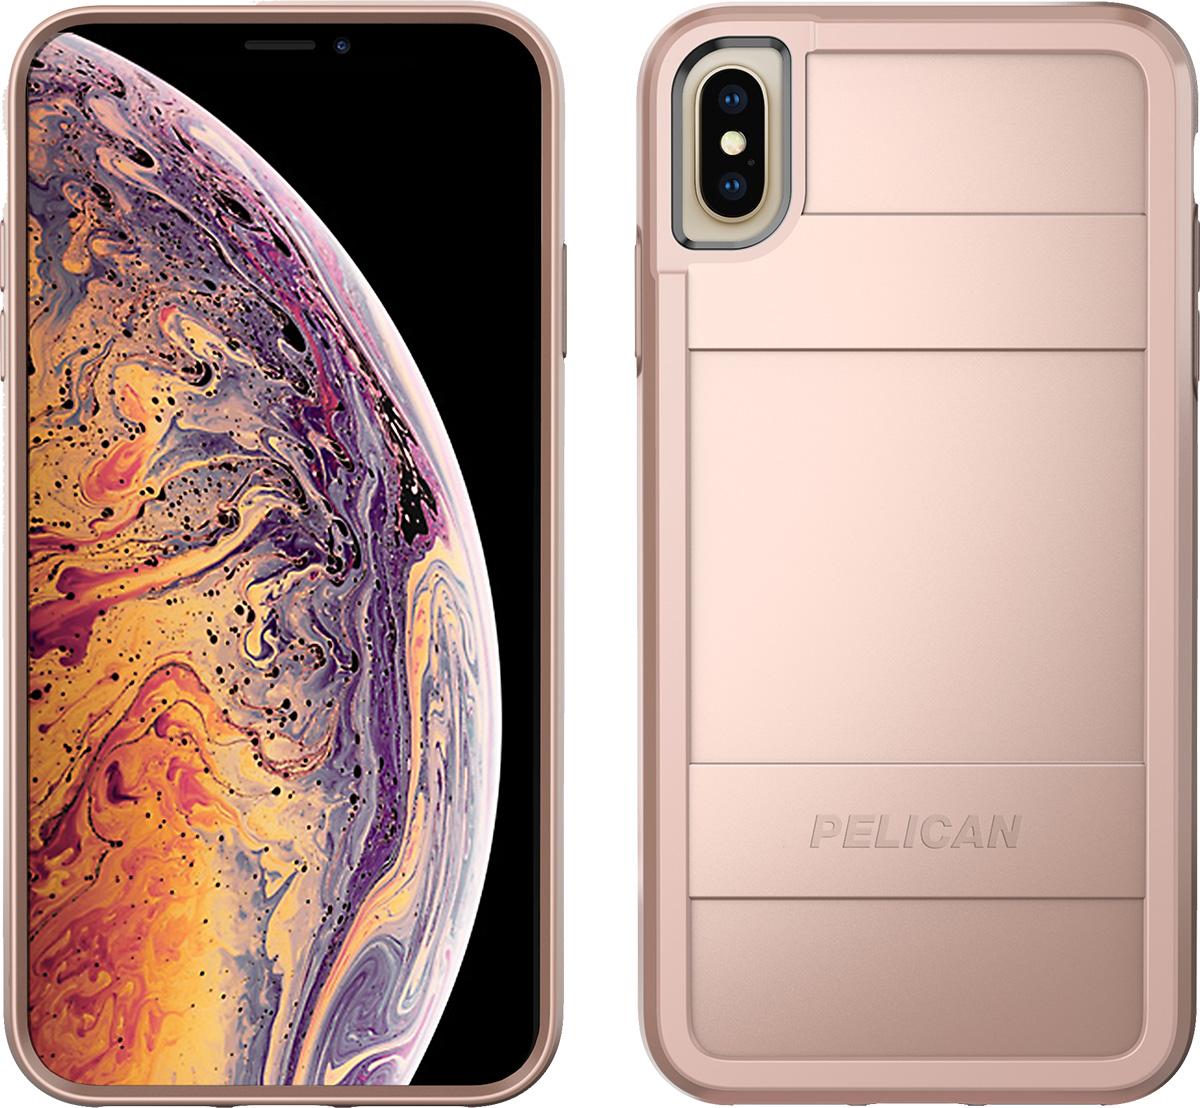 pelican c43000 apple iphone protector rose gold phone case